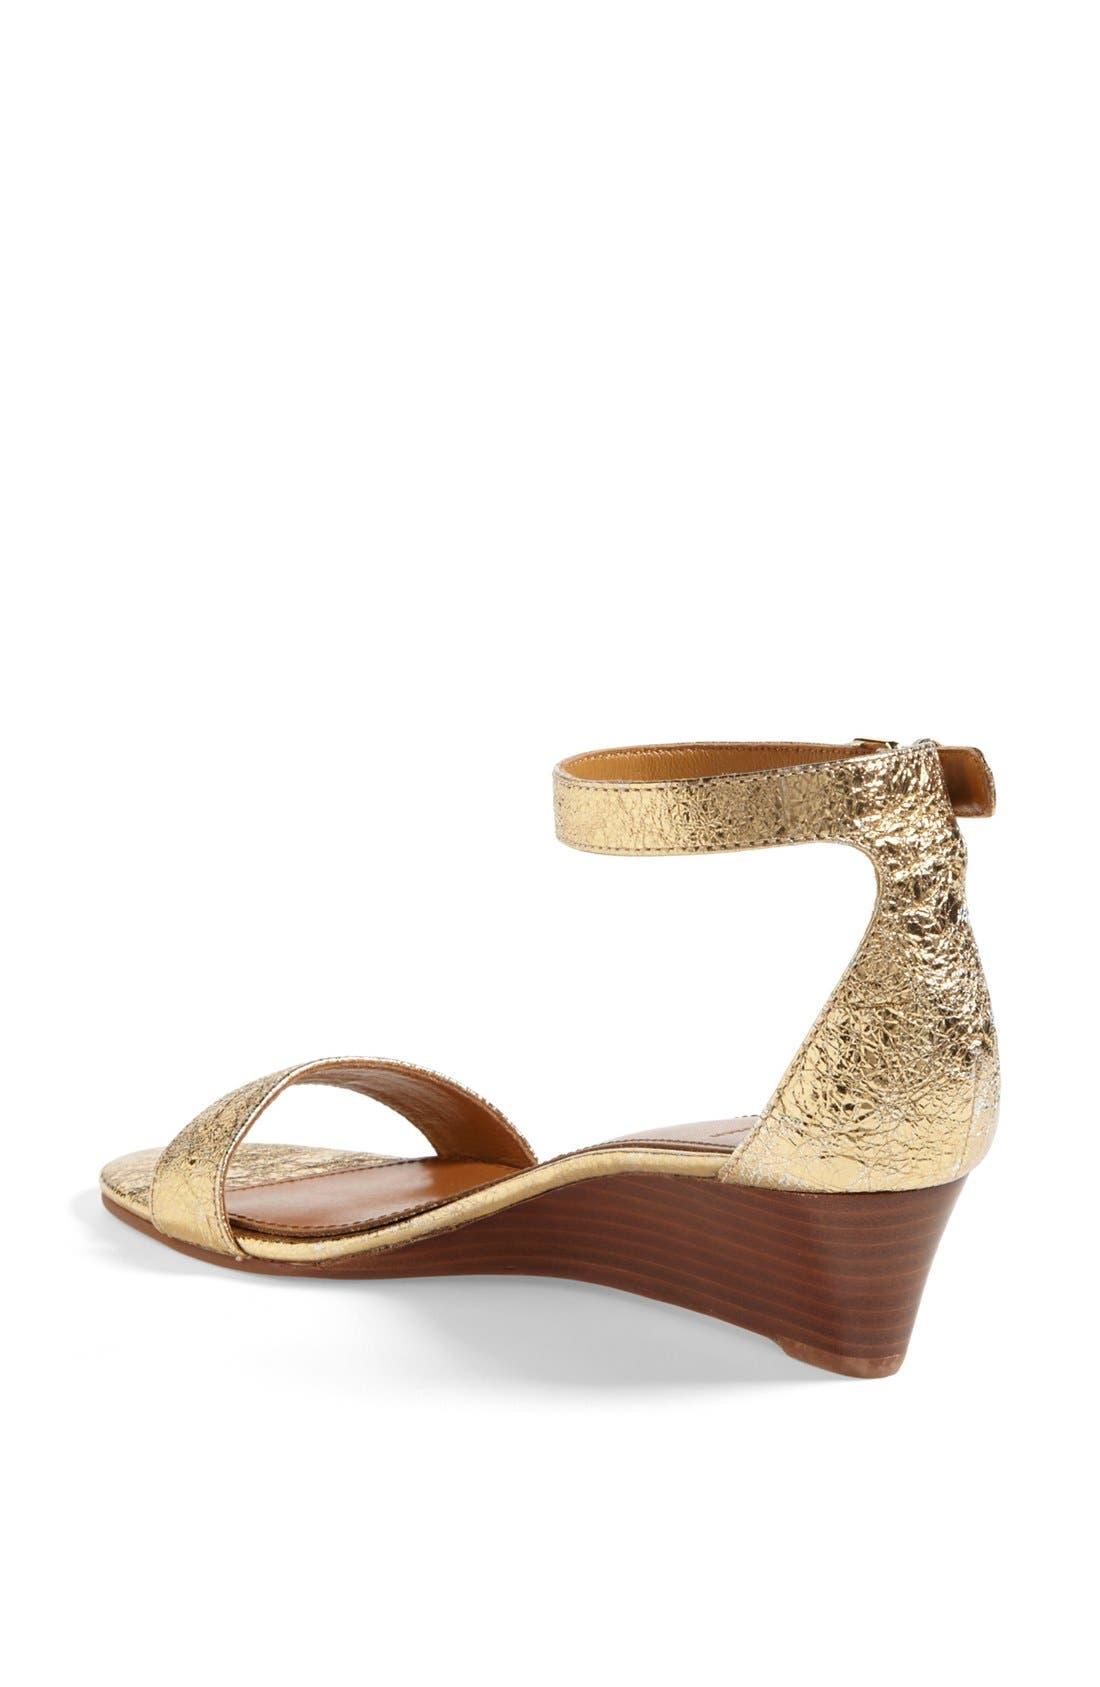 Alternate Image 2  - Tory Burch 'Savannah' Wedge Sandal